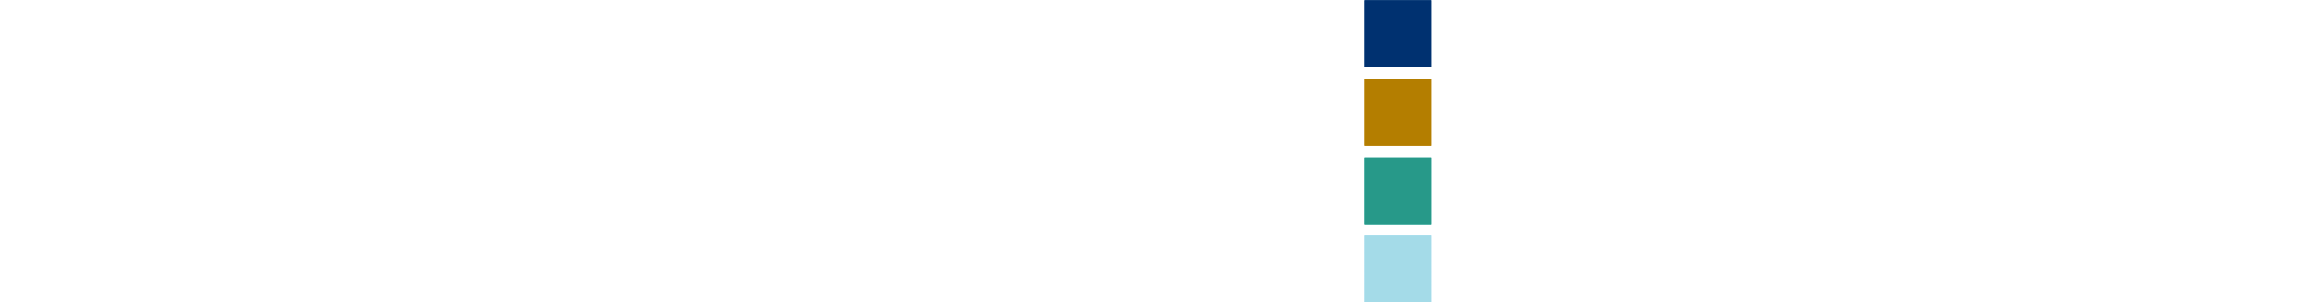 calero-mdsl-vector-recolor-white (1)